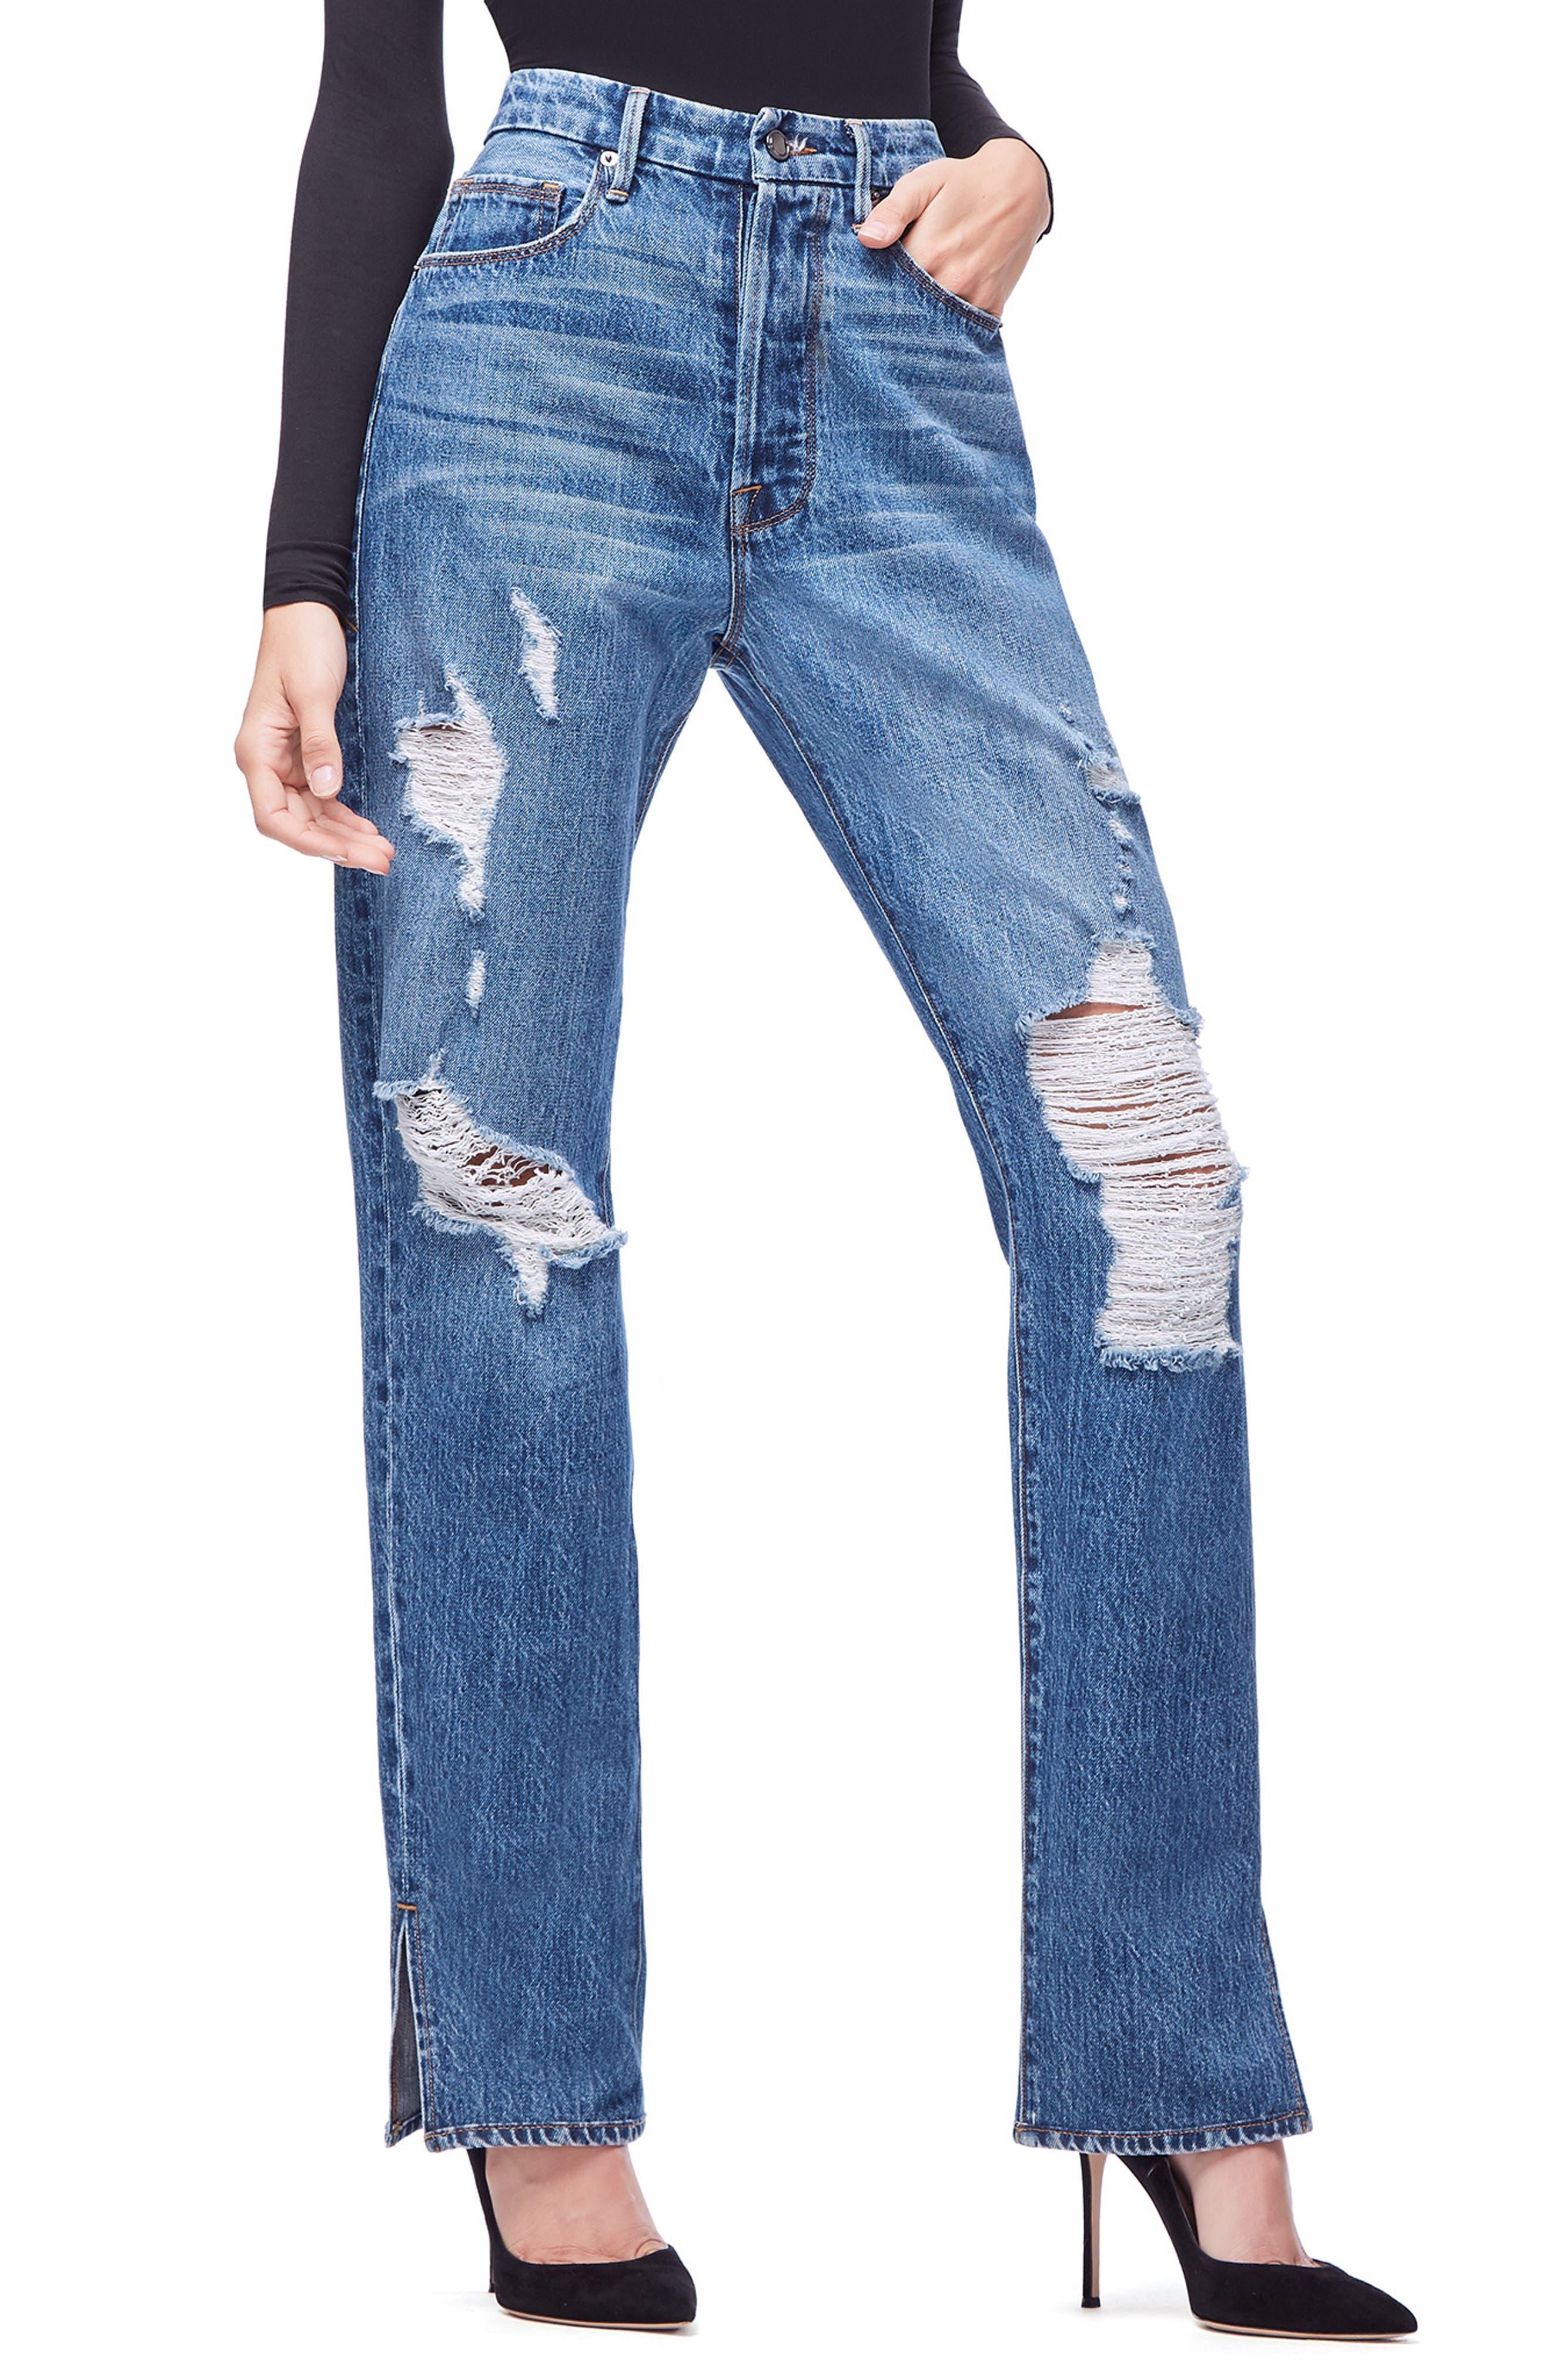 GOOD AMERICAN, Good Boy High Rise Ripped Boyfriend Jeans, Alternate thumbnail 4, color, BLUE194